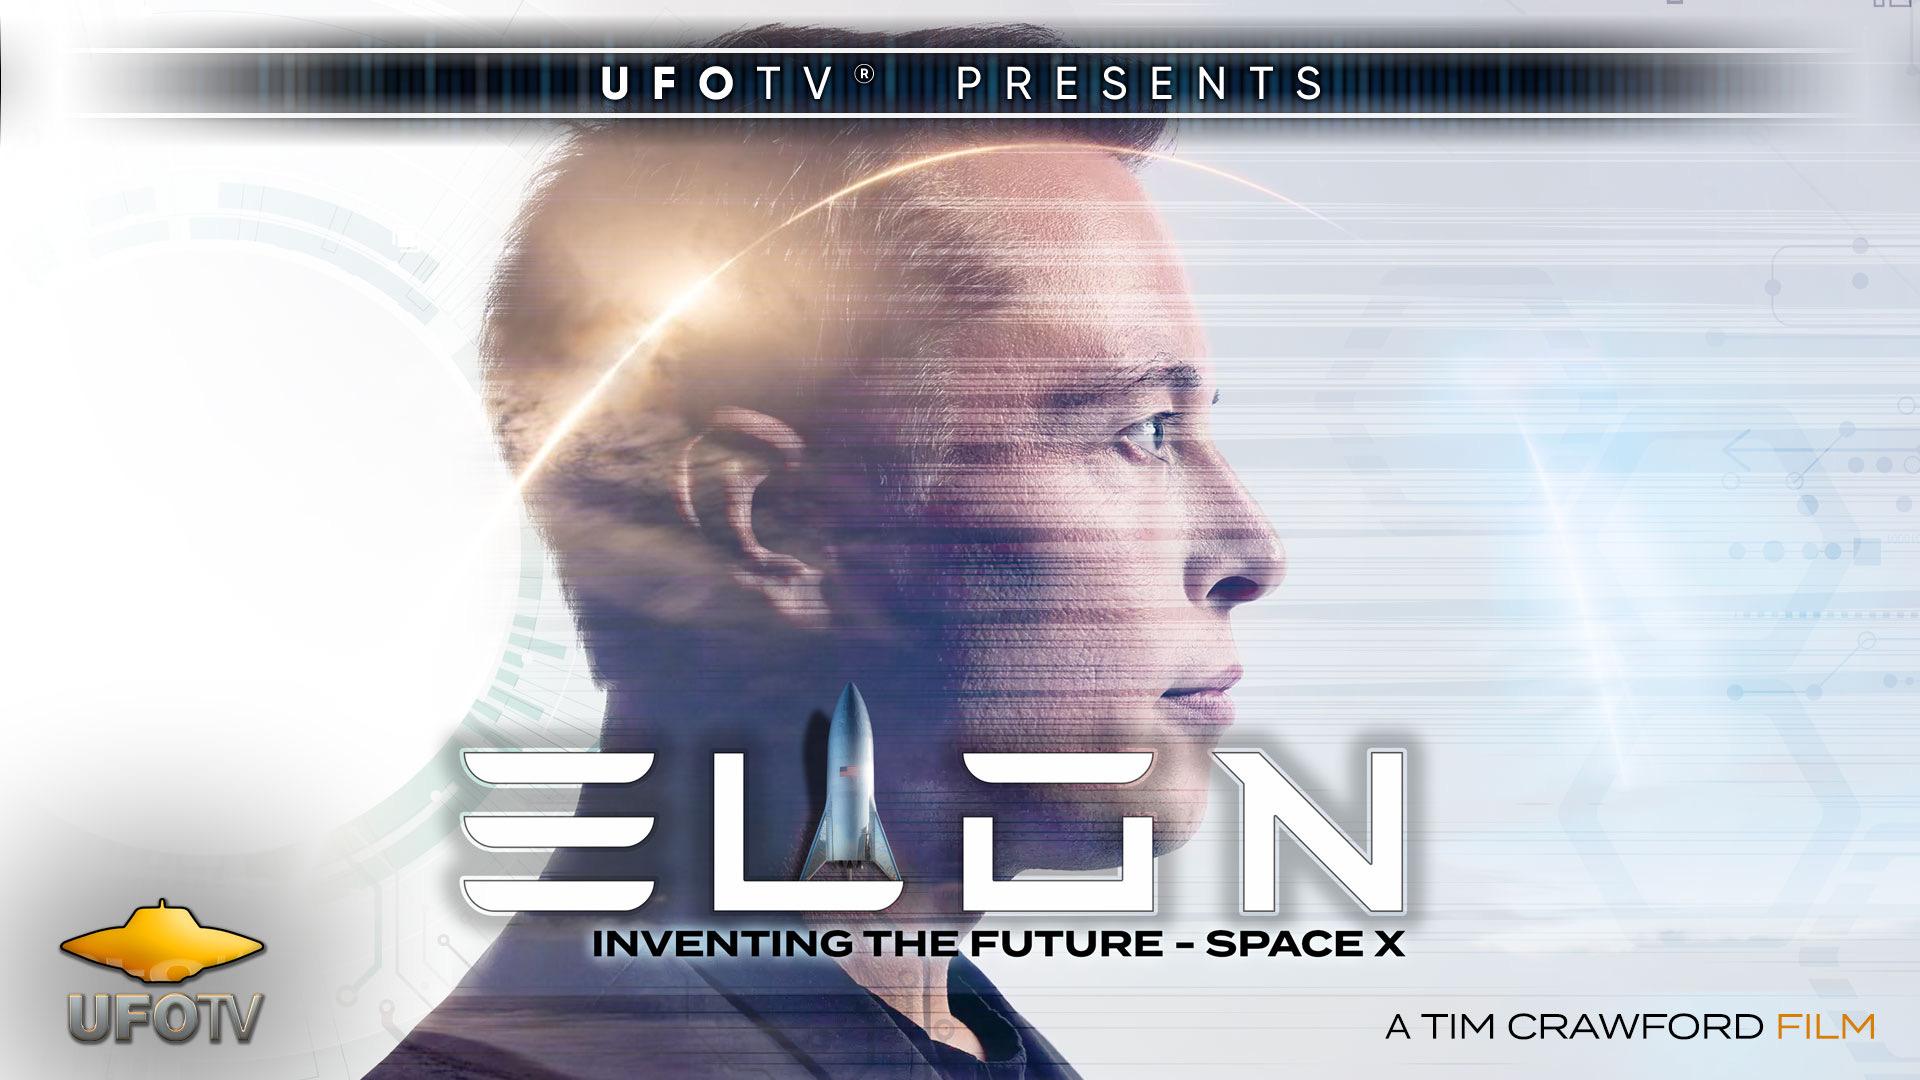 Elon - Inventing the Future - SpaceX